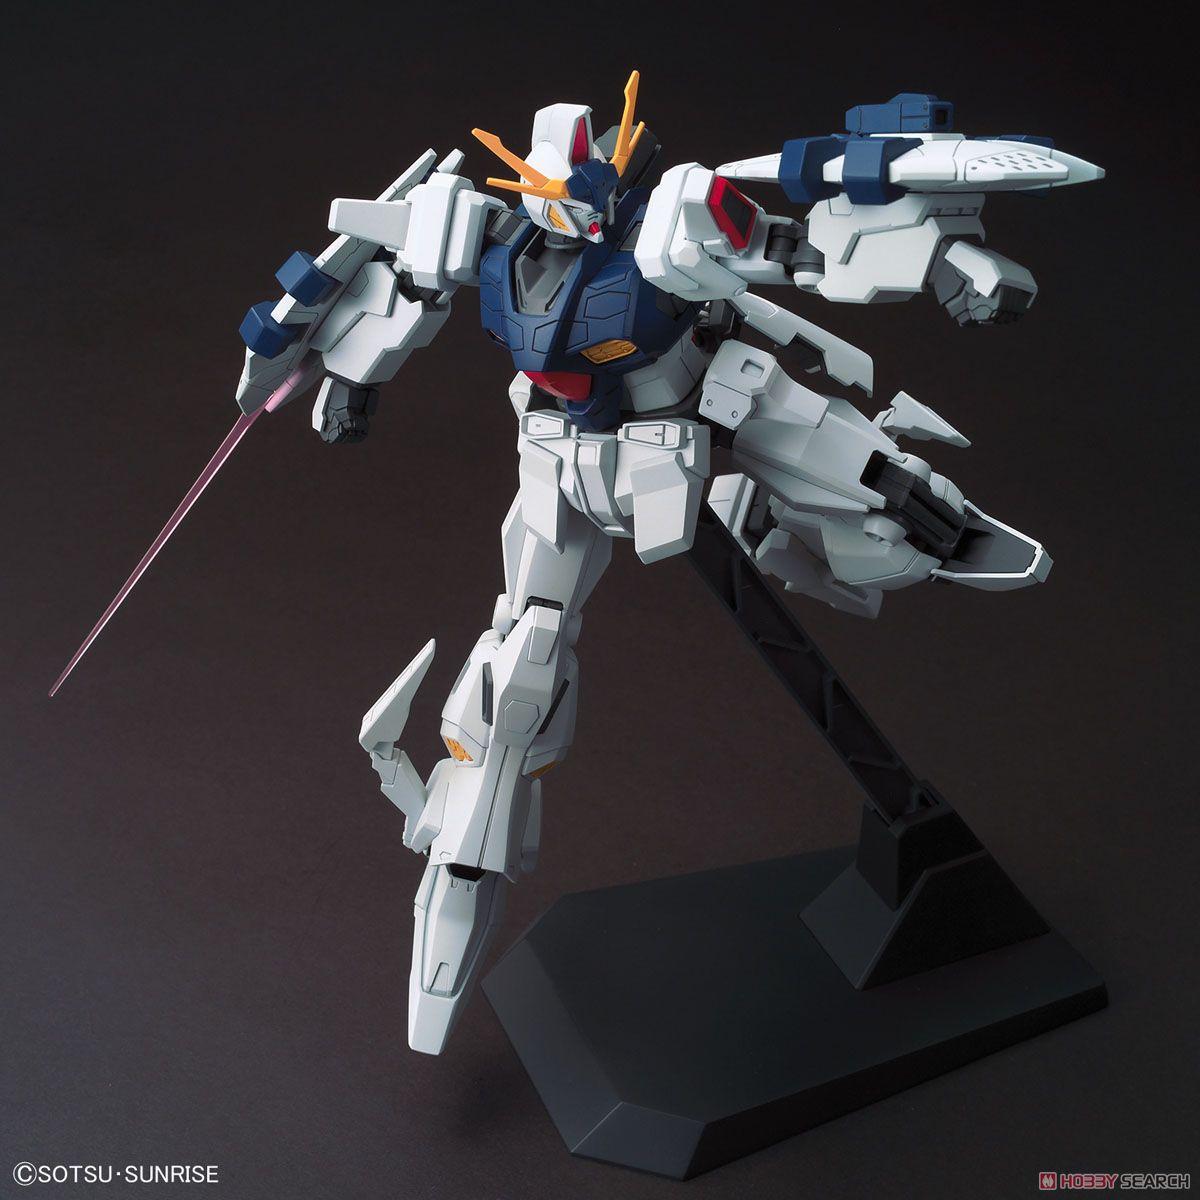 HGUC 1/144『ペーネロペー』機動戦士ガンダム 閃光のハサウェイ プラモデル-010